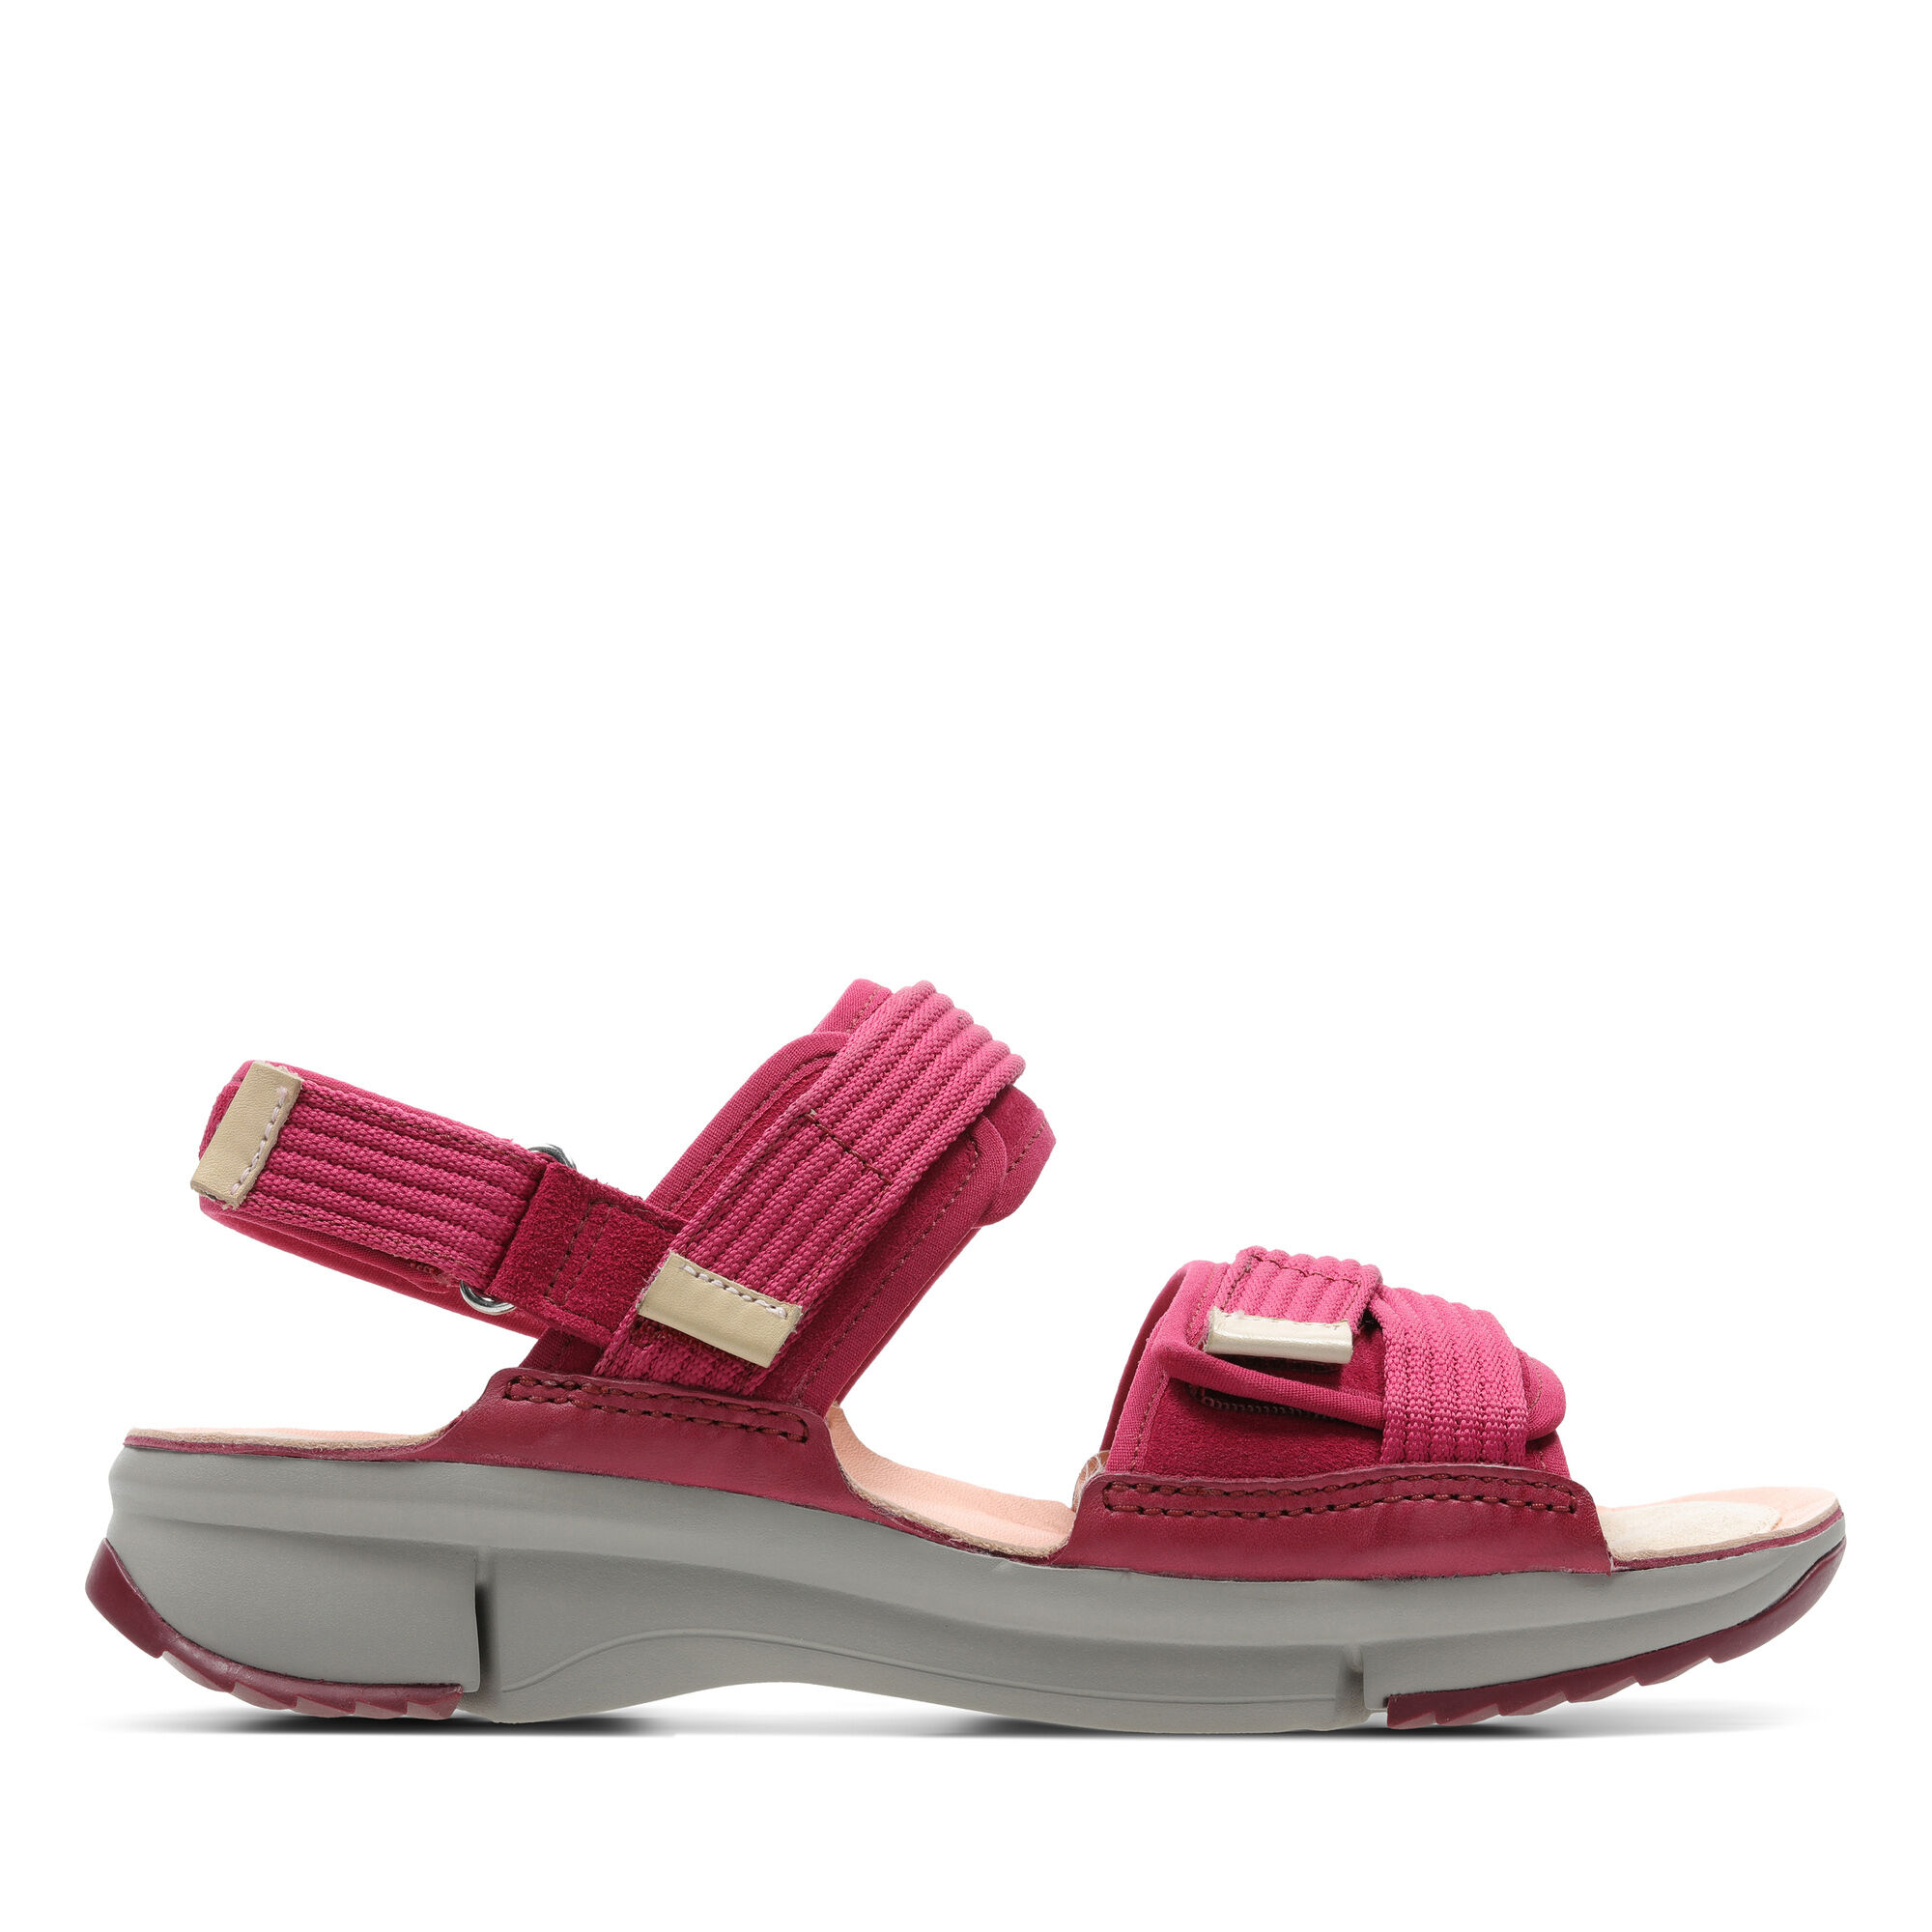 Women's Berry Sandals - Tri Walk   Clarks